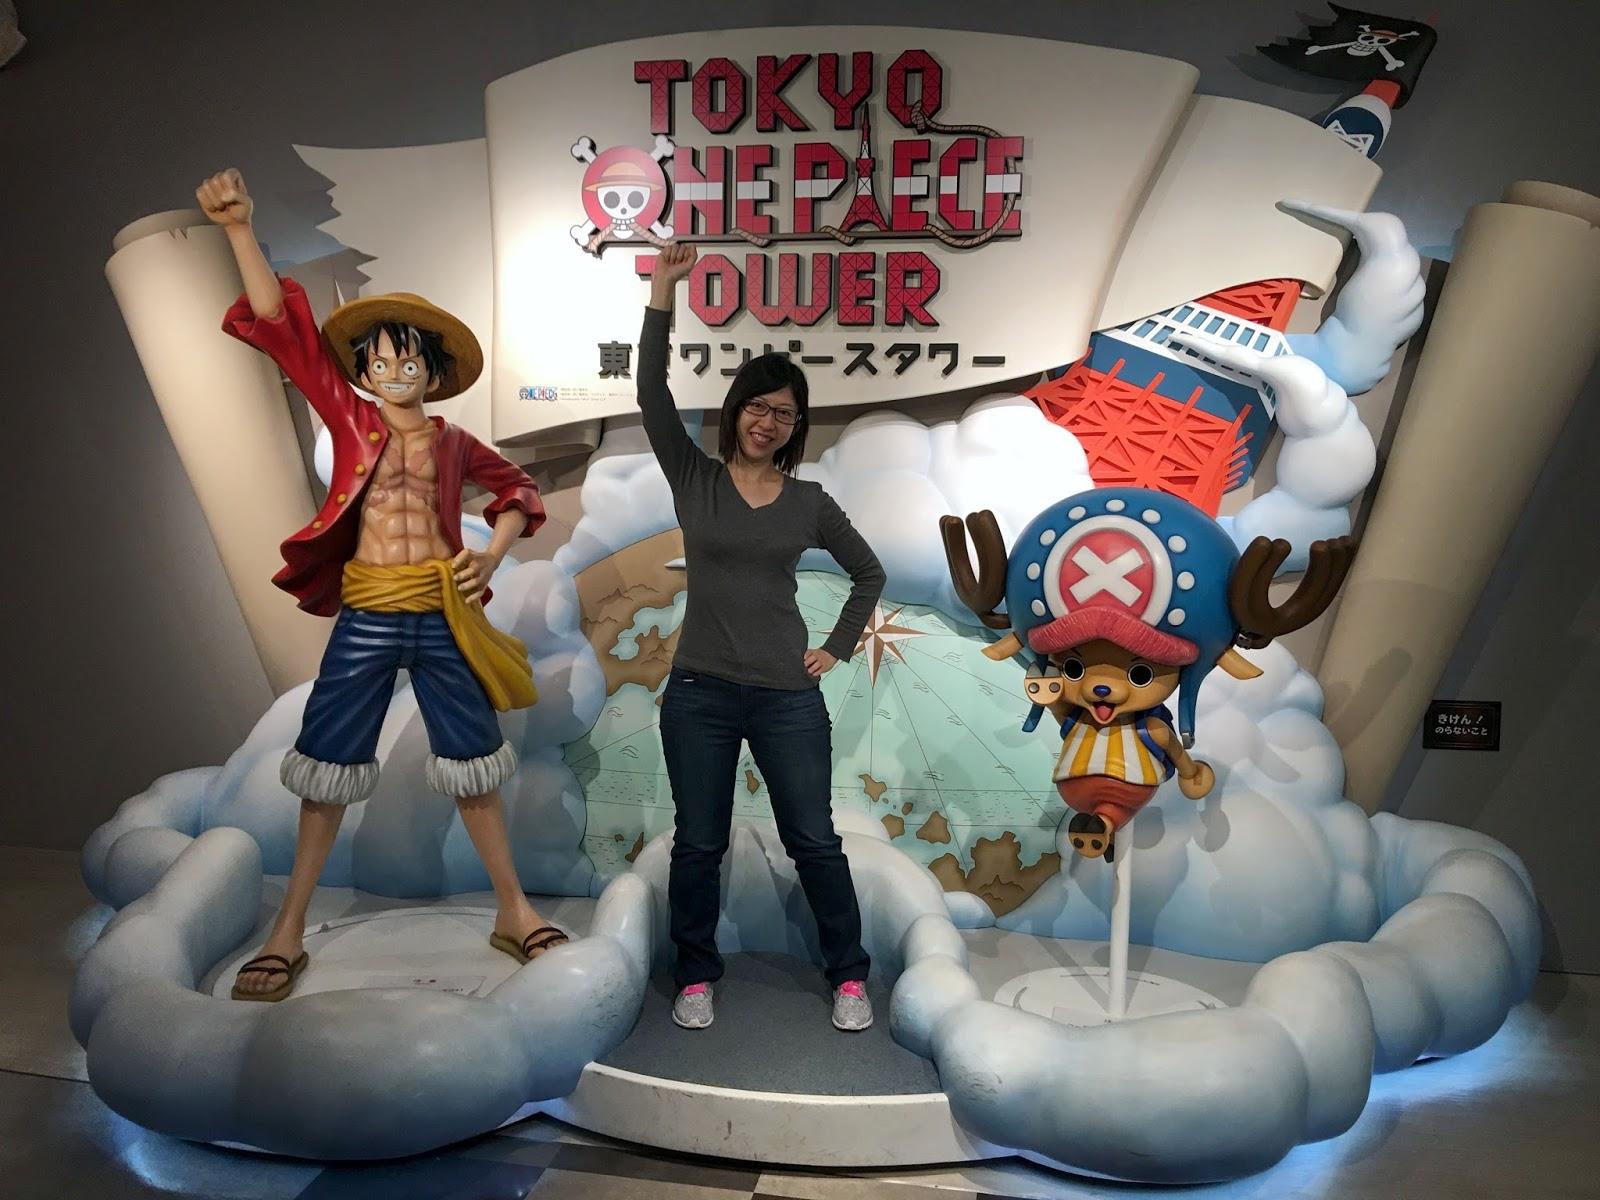 evacomics blog tokyo one piece tower